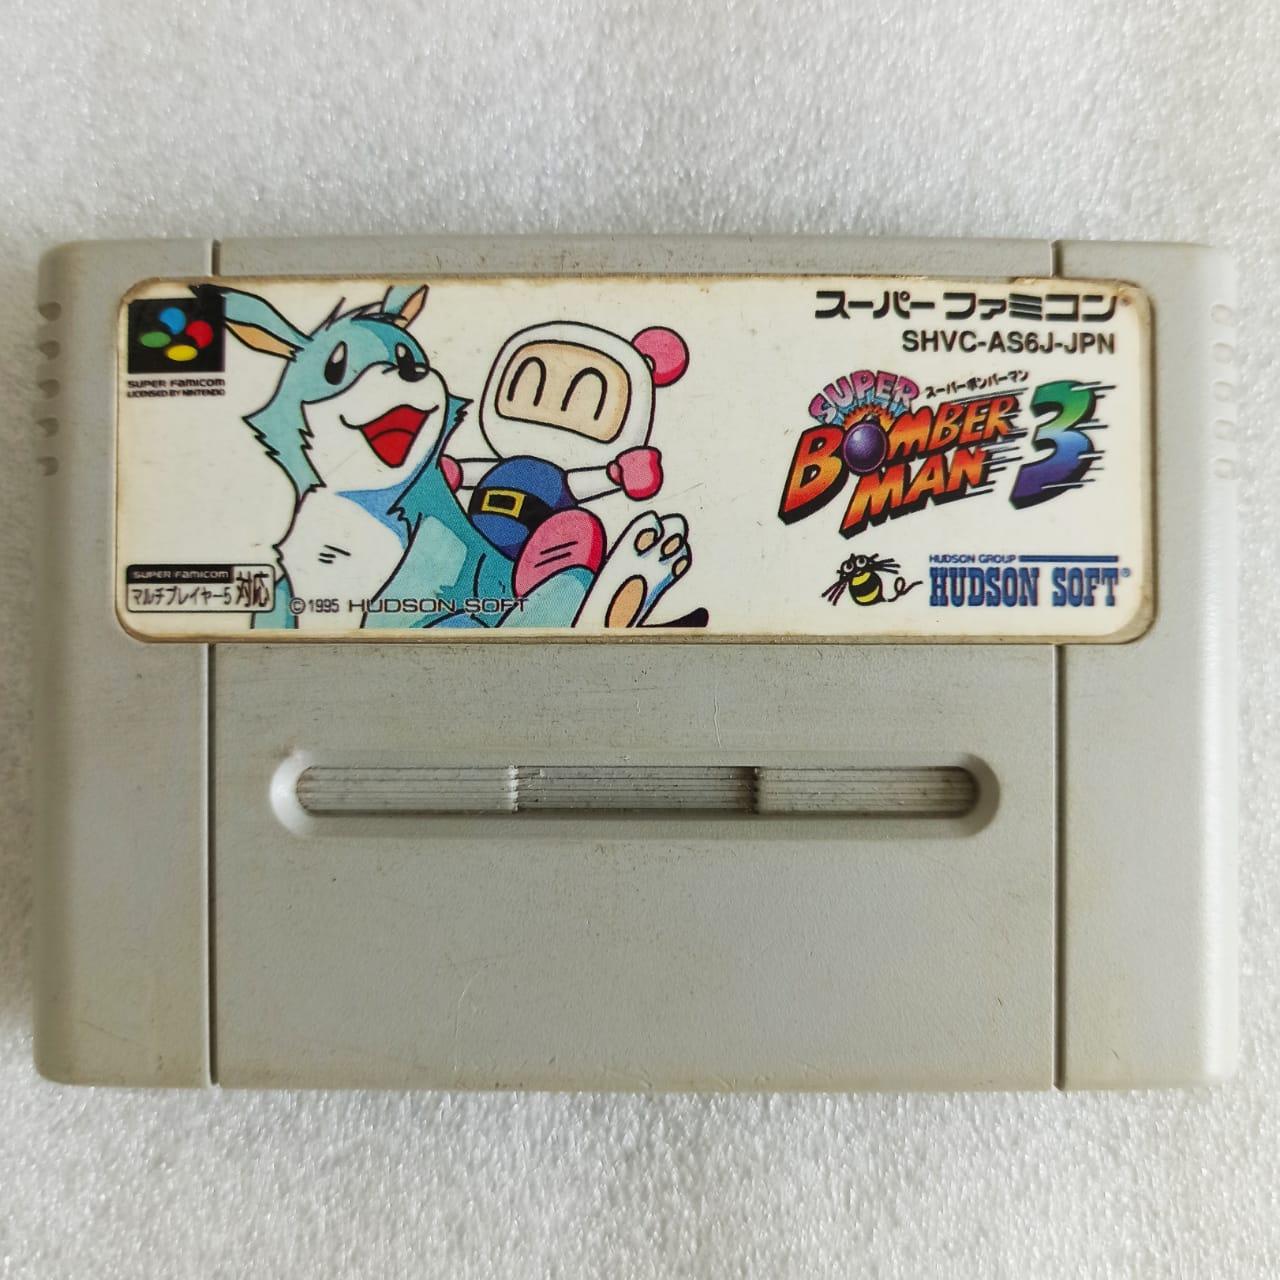 Super Bomberman 3 (Paralelo) - Usado - Super Nintendo